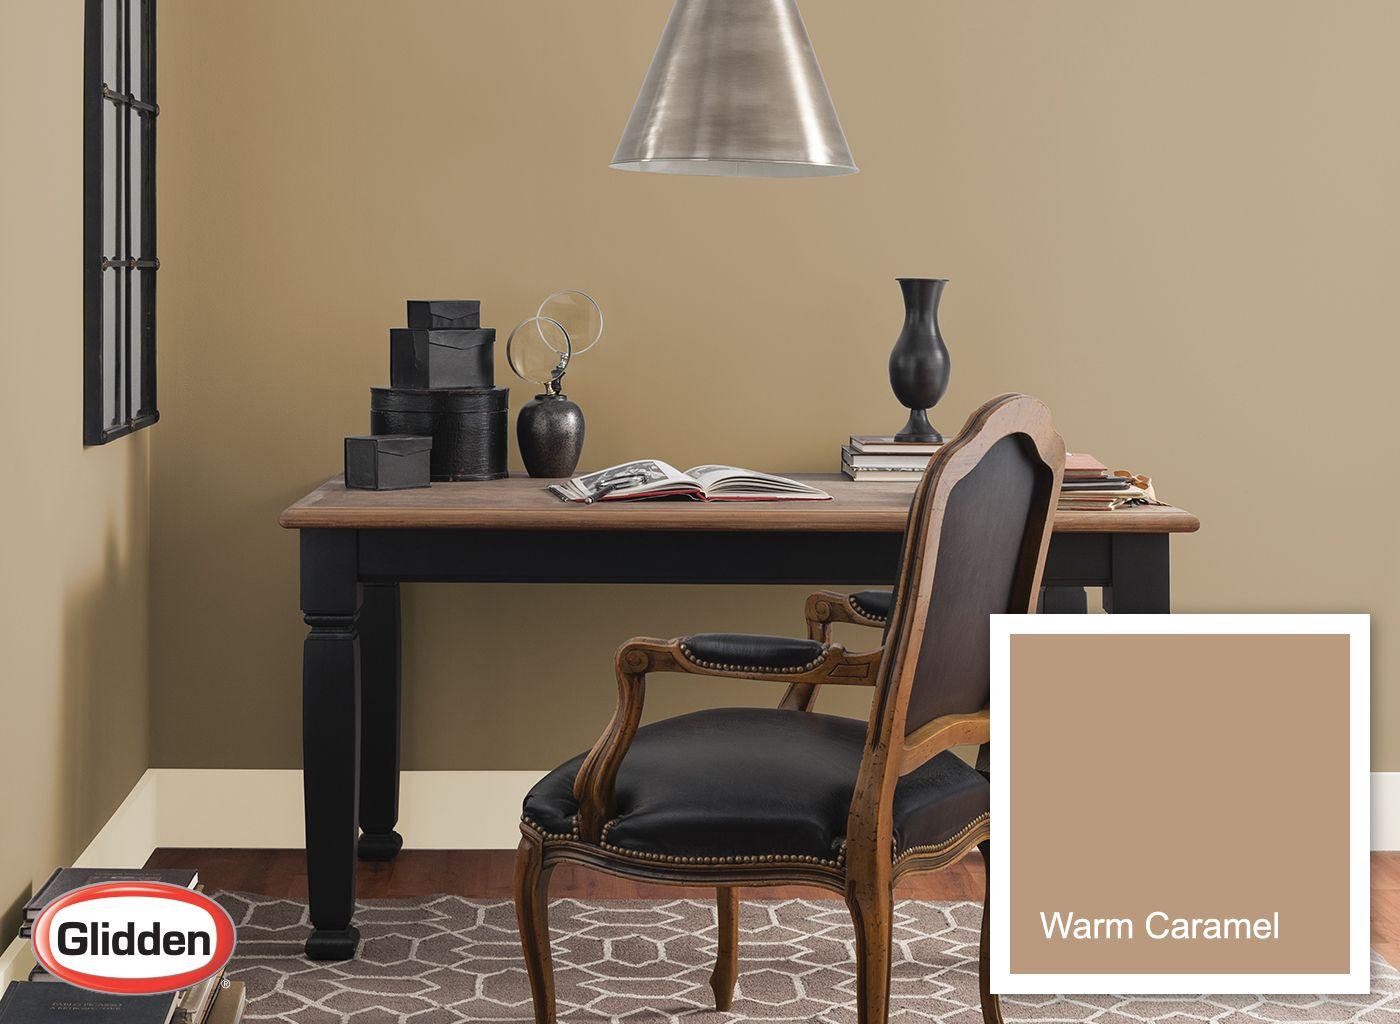 Warm Caramel Large Jpg 1400 1024 Bedroom Interior House Interior Warm Interior #warm #living #room #wall #colors